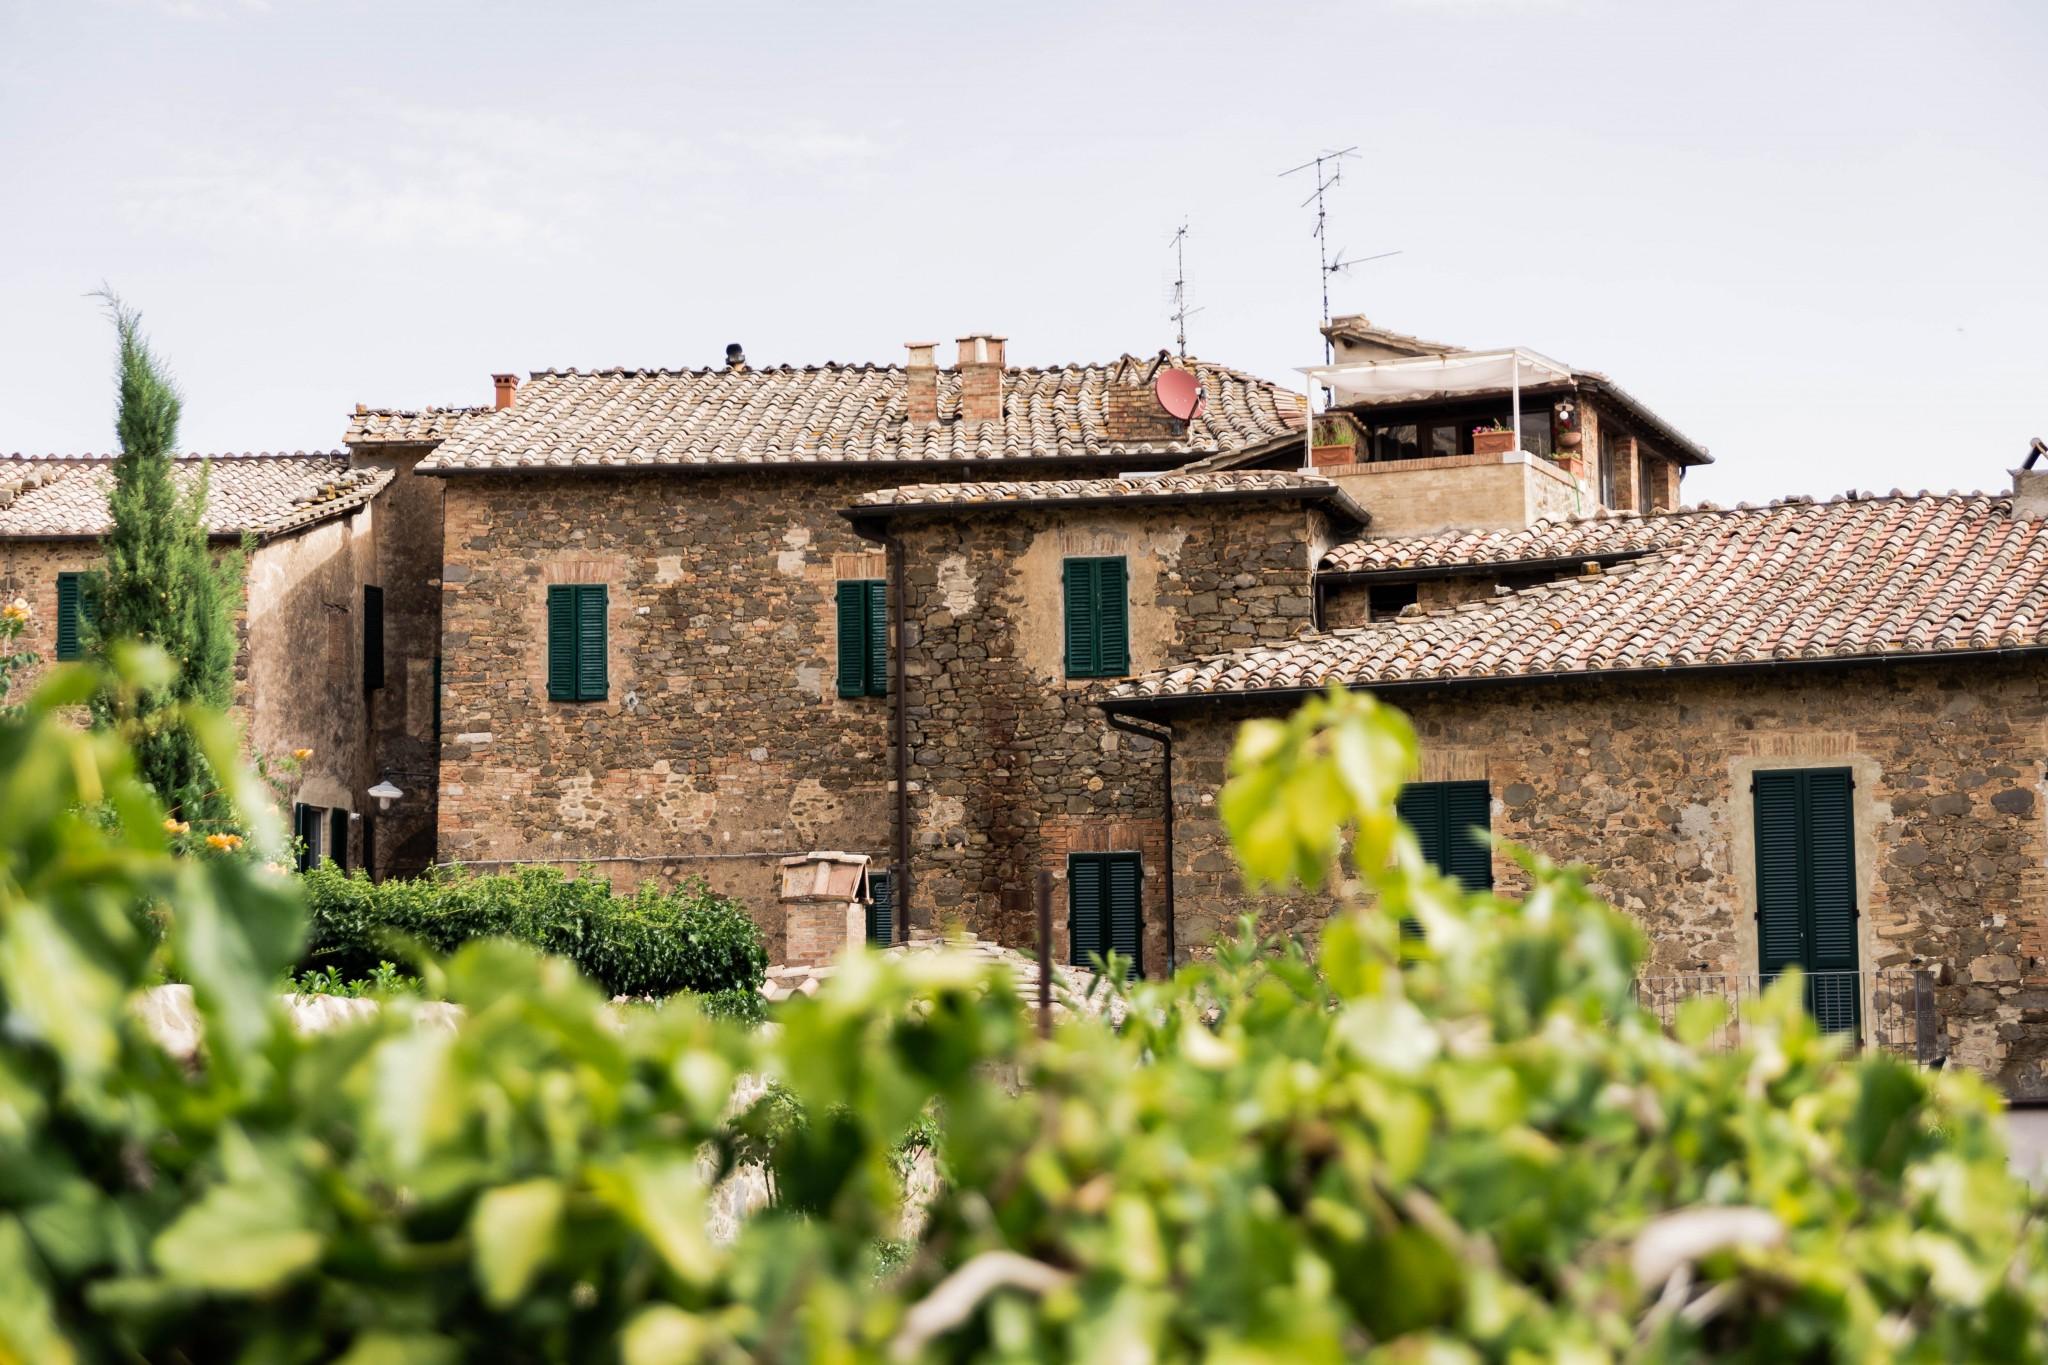 tuscany2 (34 of 39)